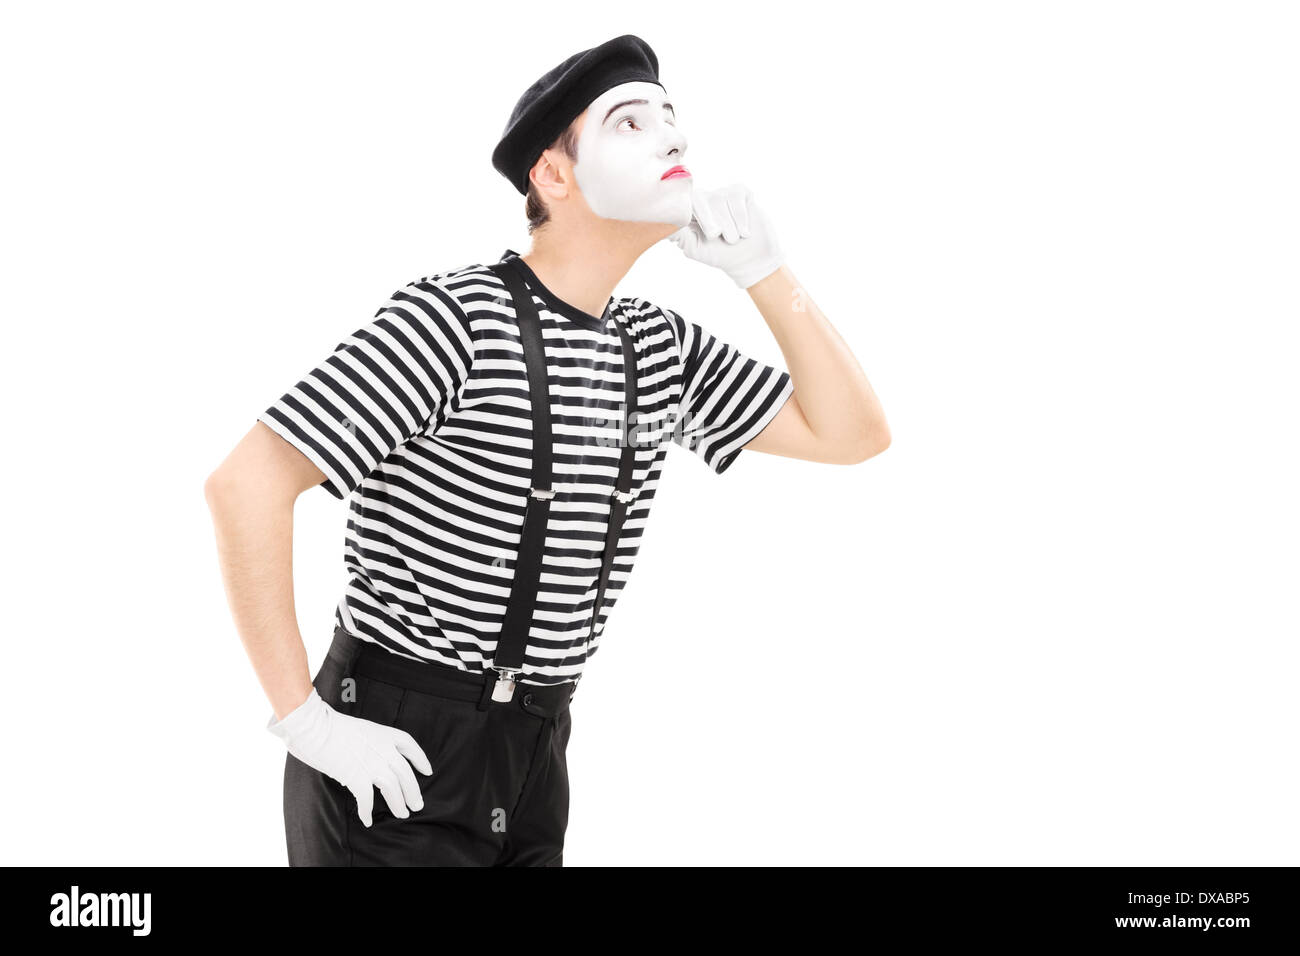 Mime artist listening something - Stock Image